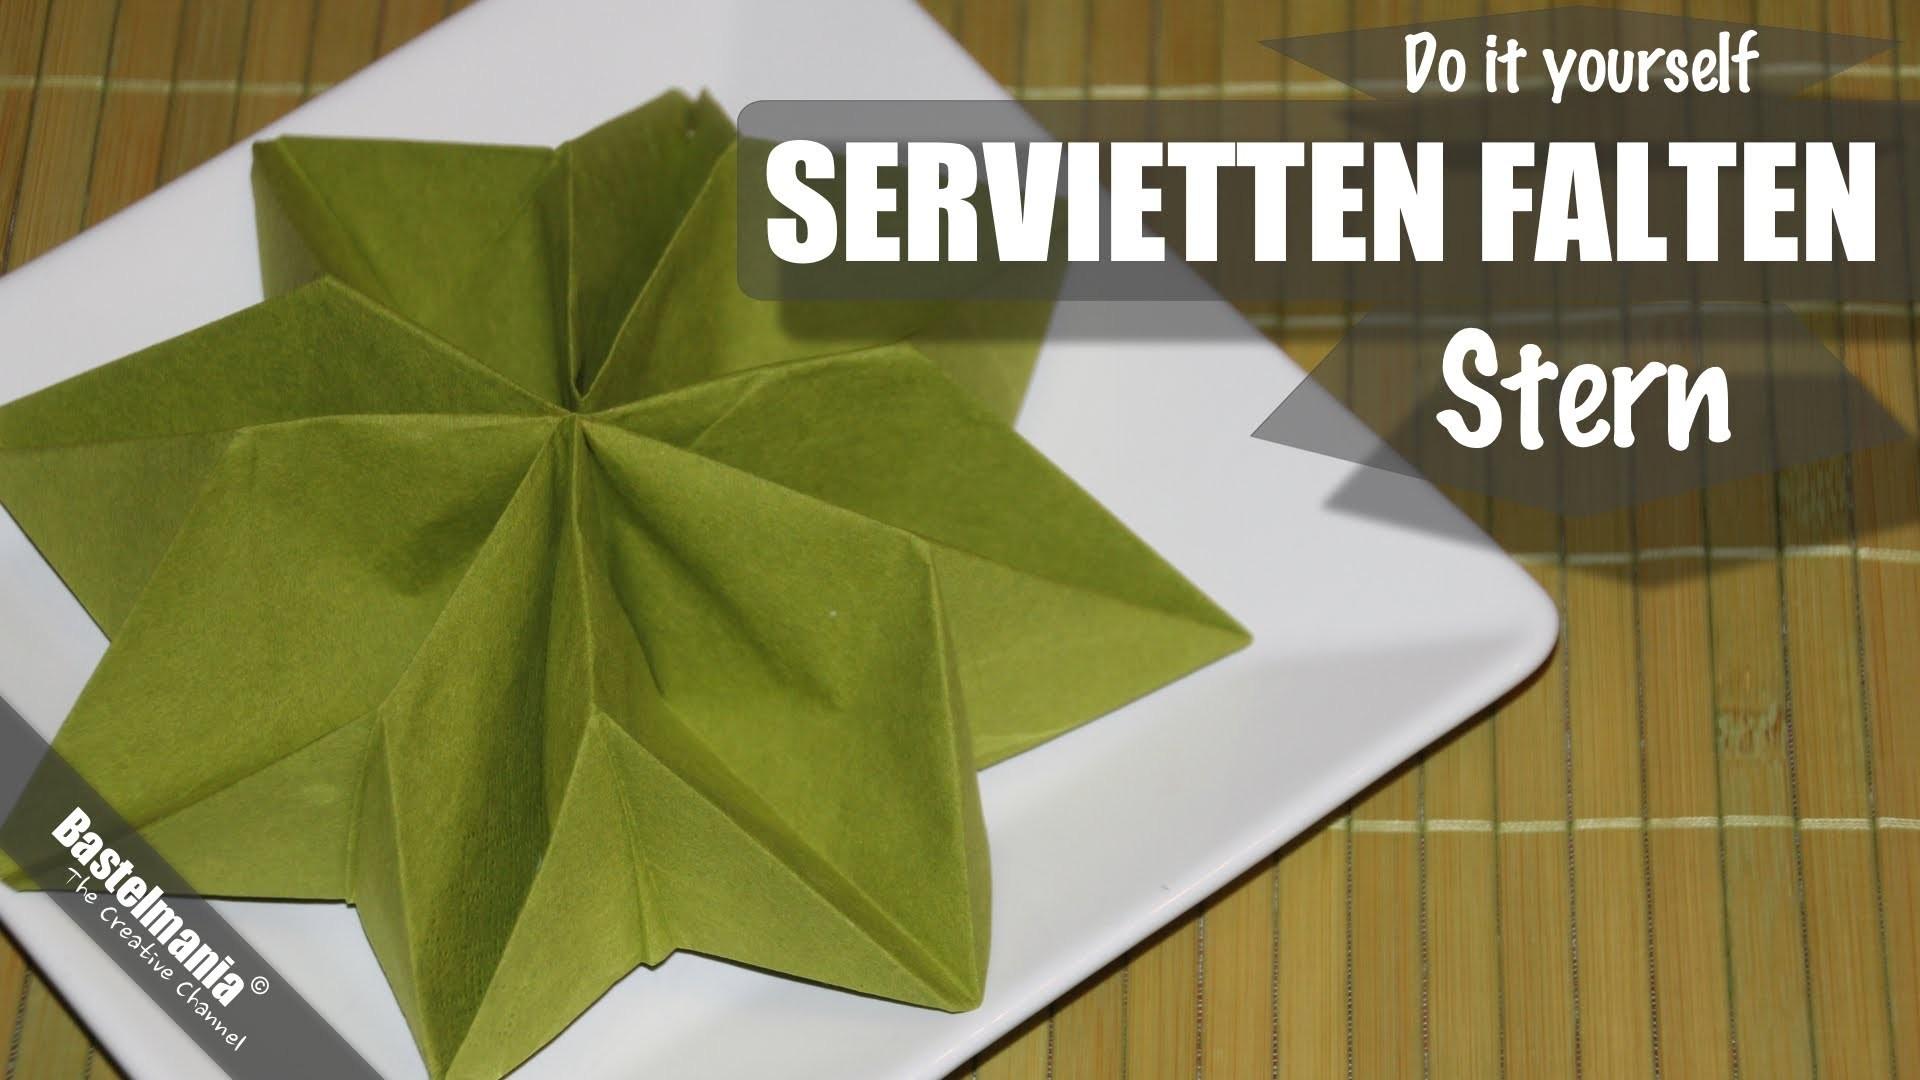 SERVIETTEN FALTEN Anleitung Stern Weihnachten DIY NAPKIN FOLDING Star Christmas